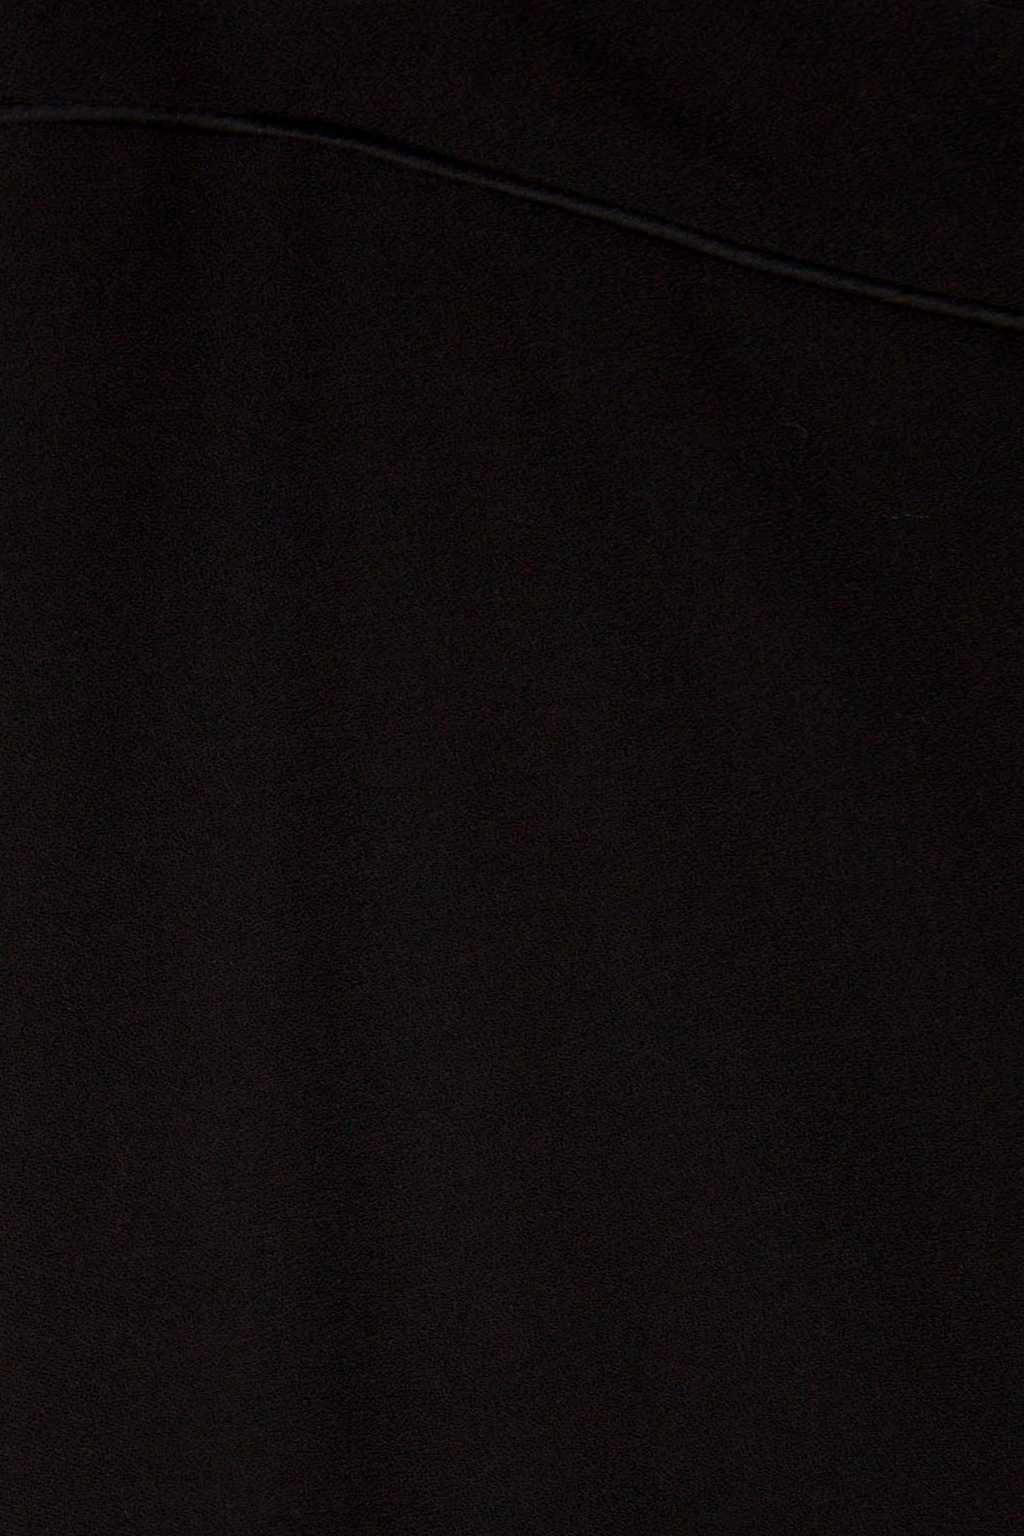 Pant 2104 Black 9